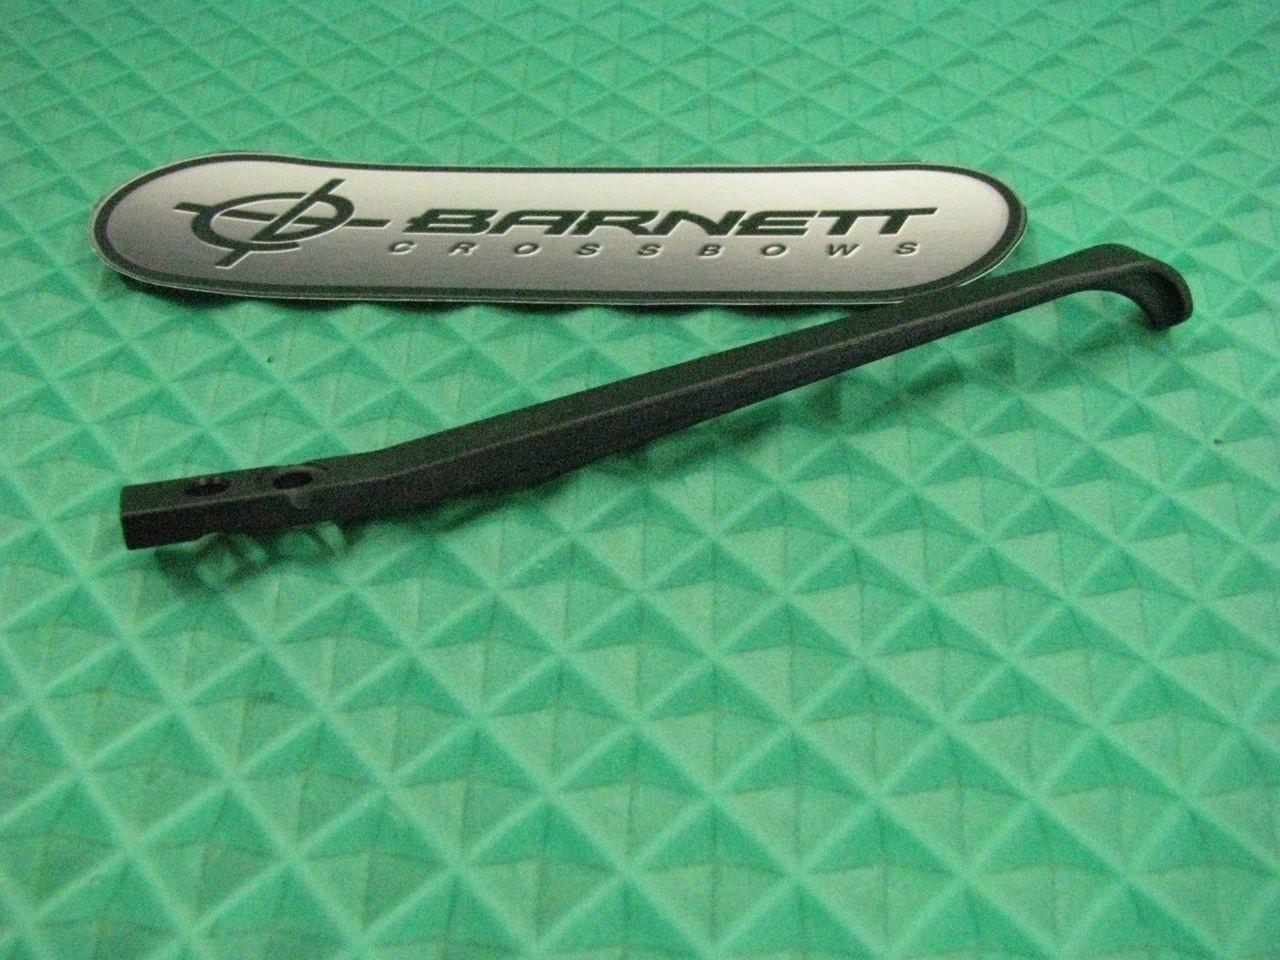 Barnett Crossbow Arrow Bolt Retention Spring Retainer Holder #3166